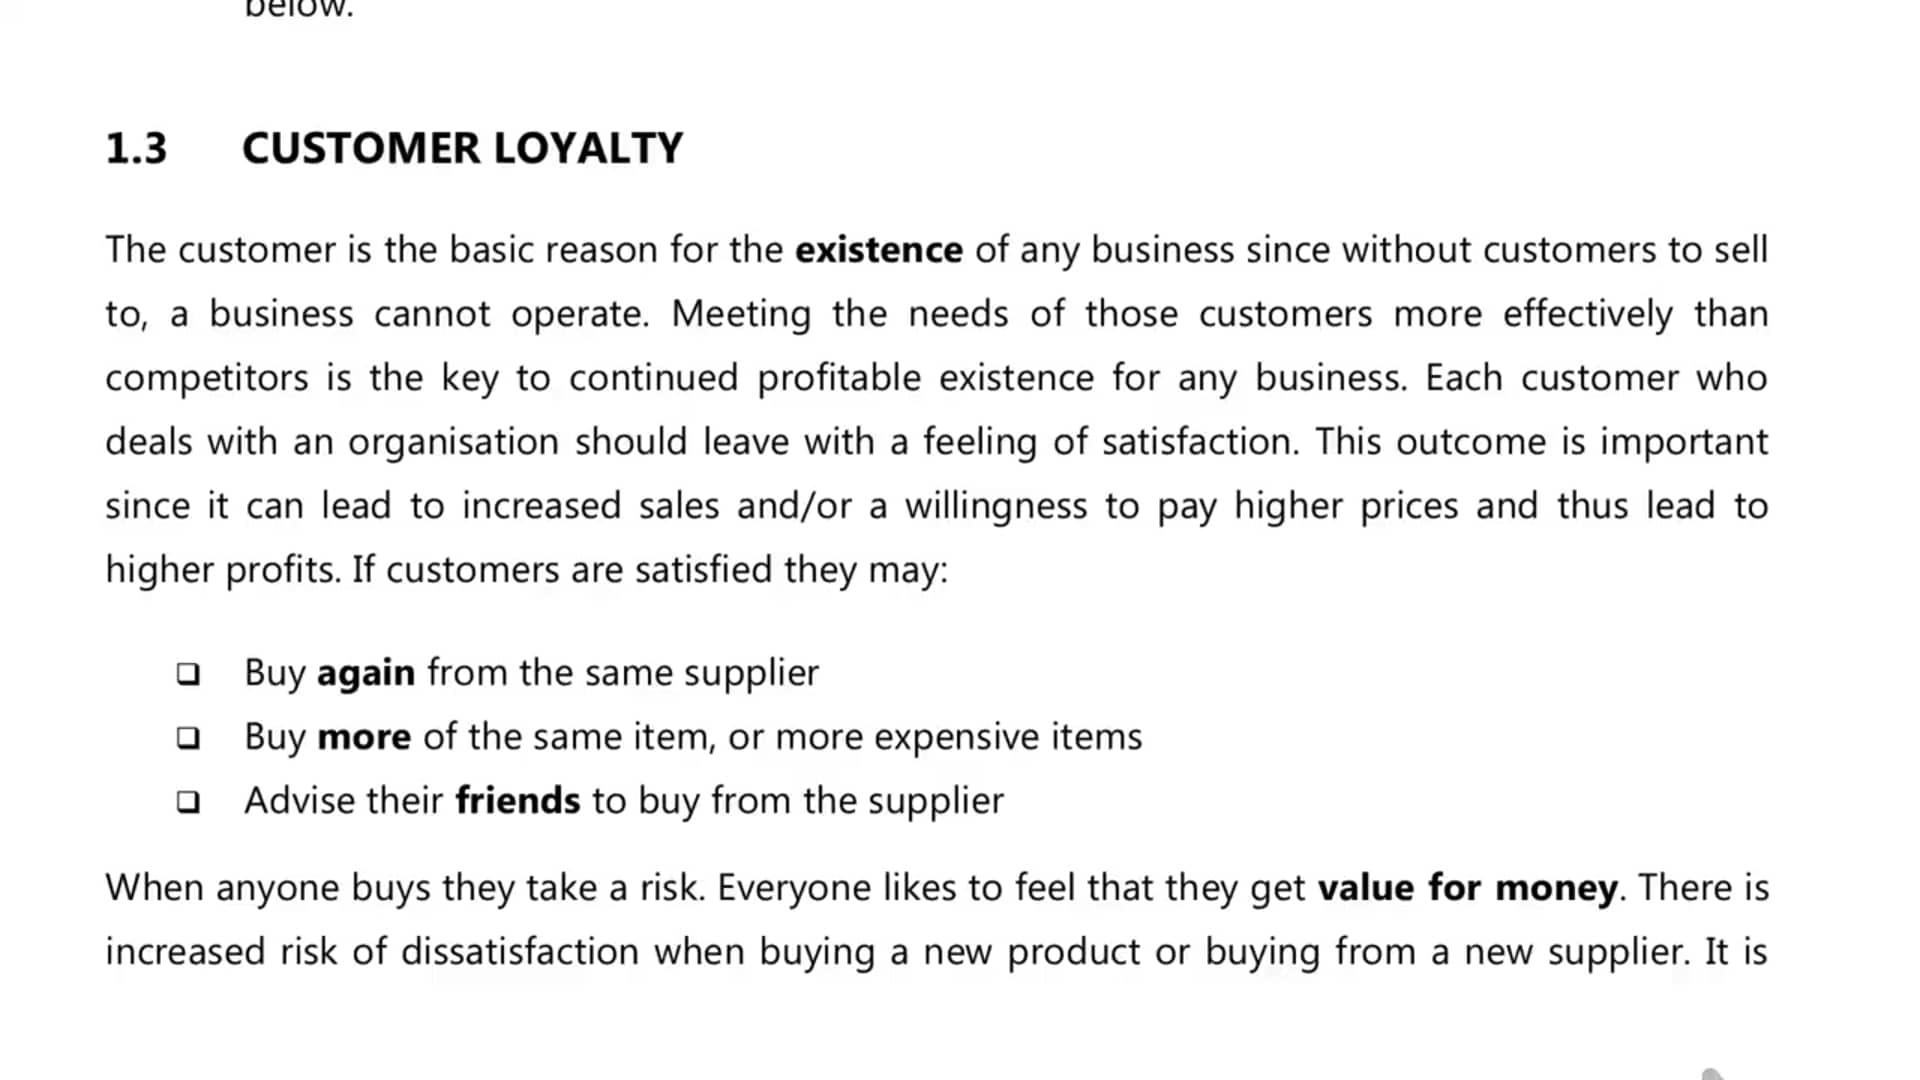 Ch 3 - Customer Loyalty